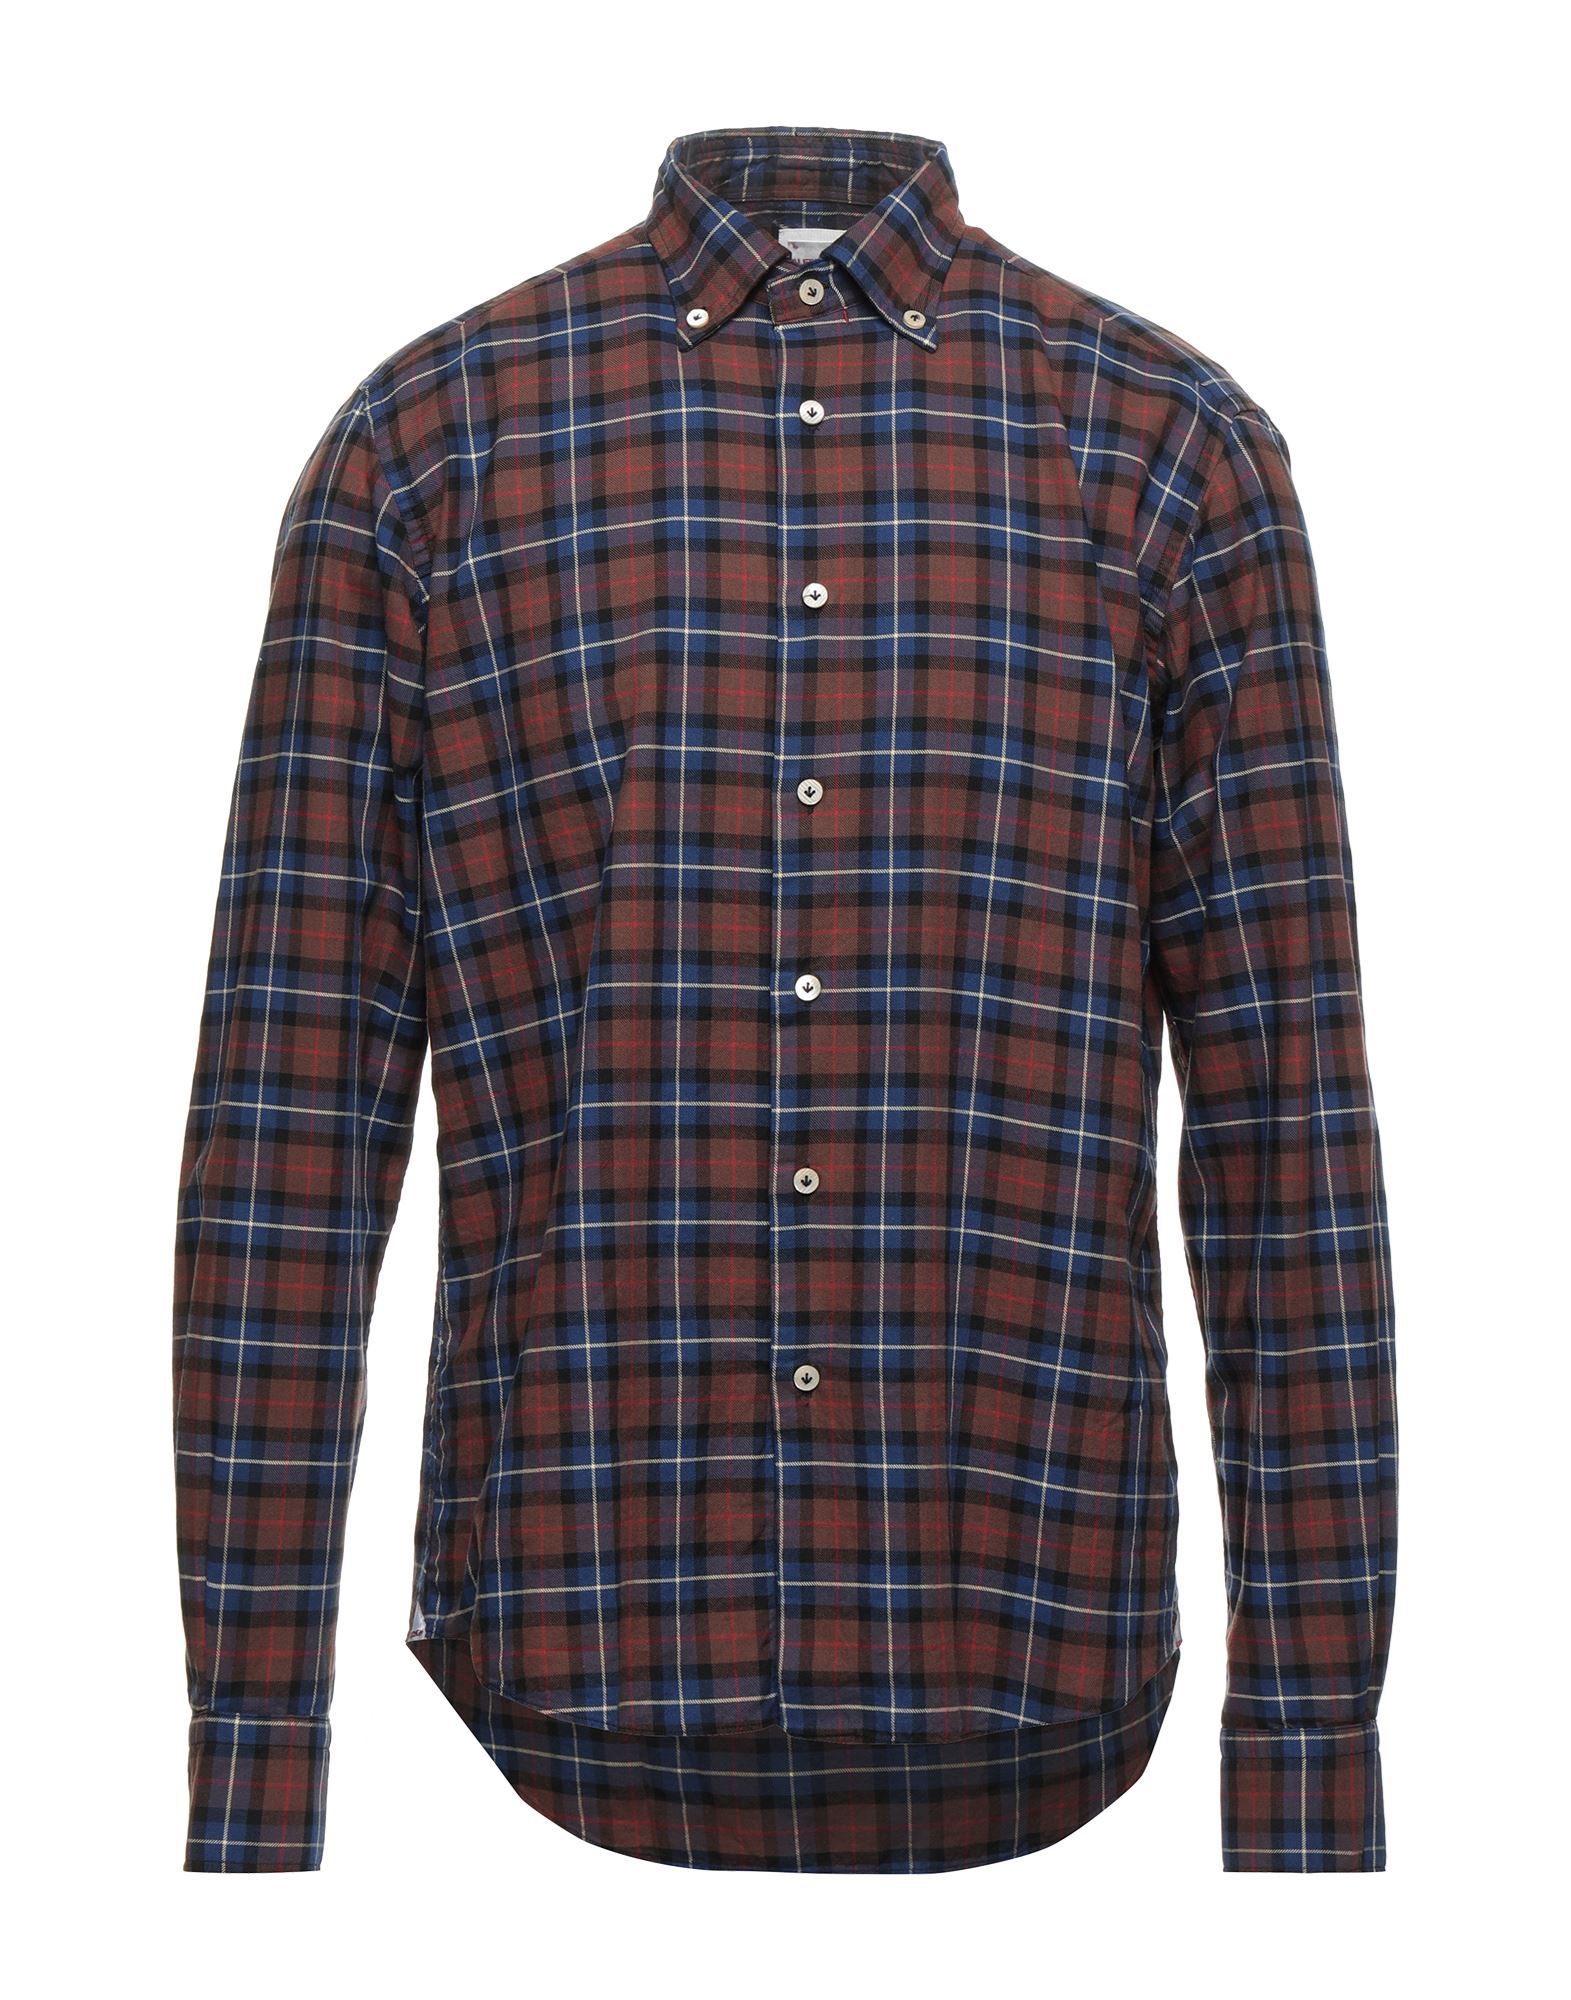 Alex Ingh Shirts In Brown